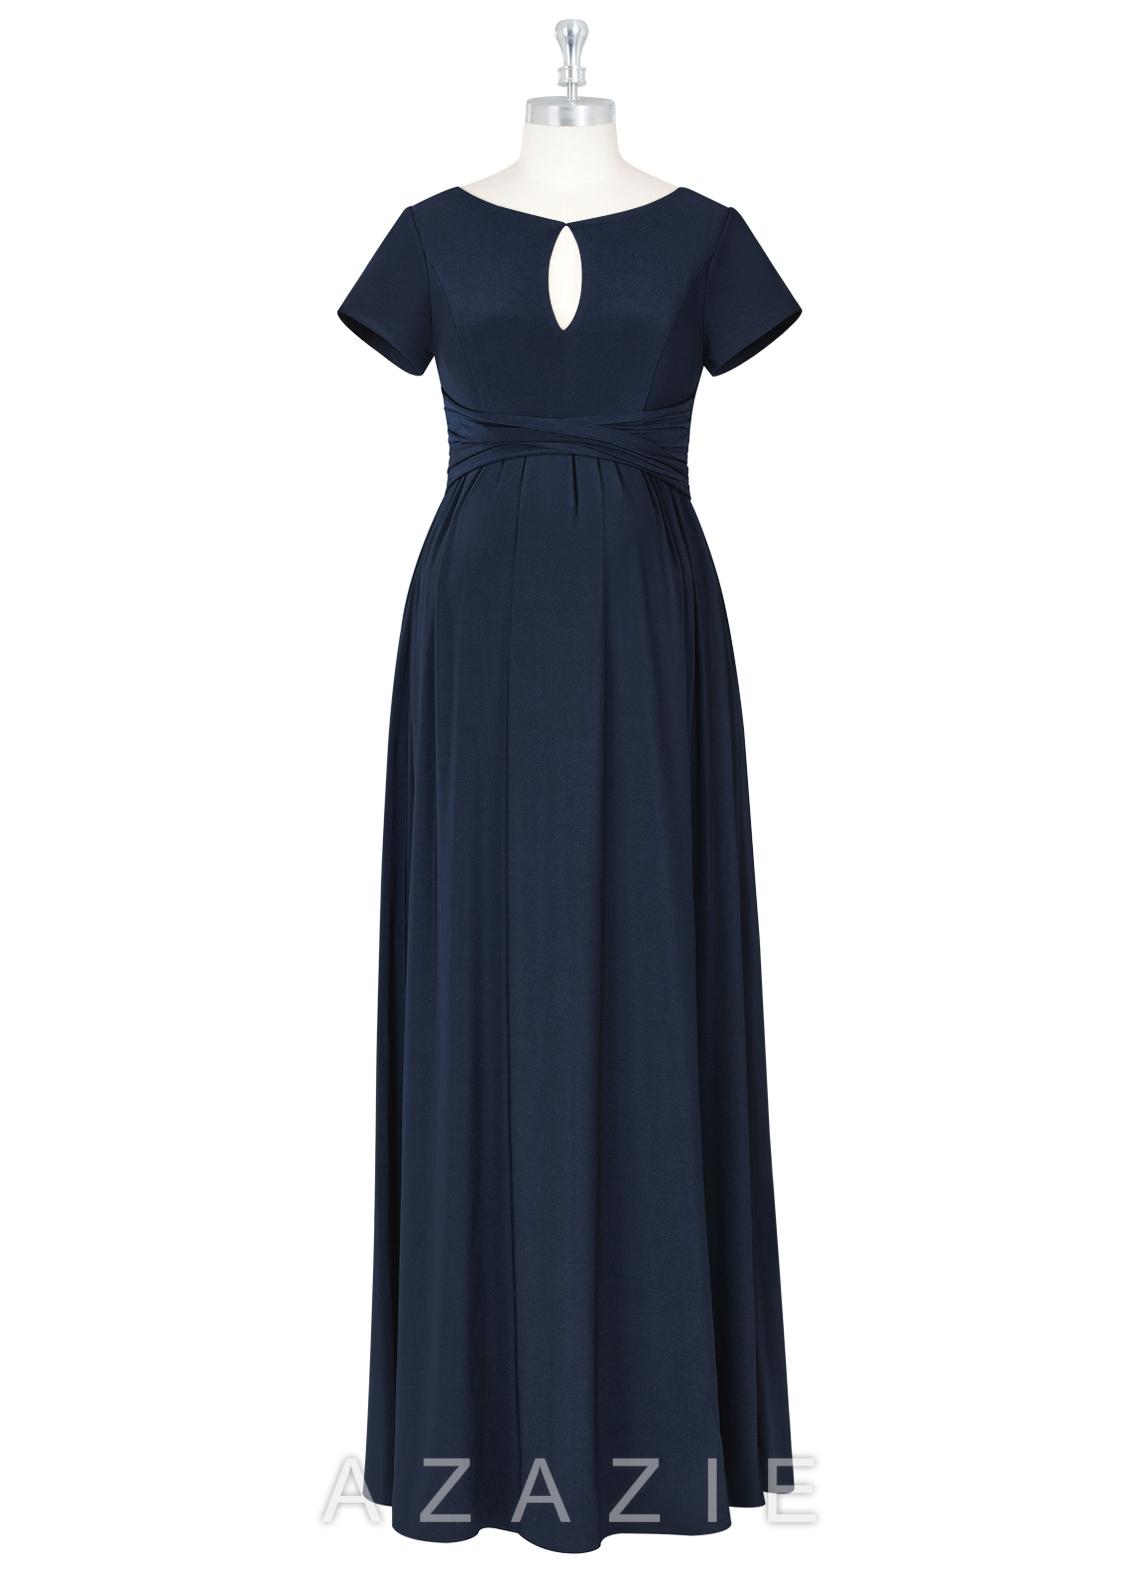 Maternity bridesmaid dresses bridesmaid gowns azazie azazie whitney azazie whitney ombrellifo Image collections